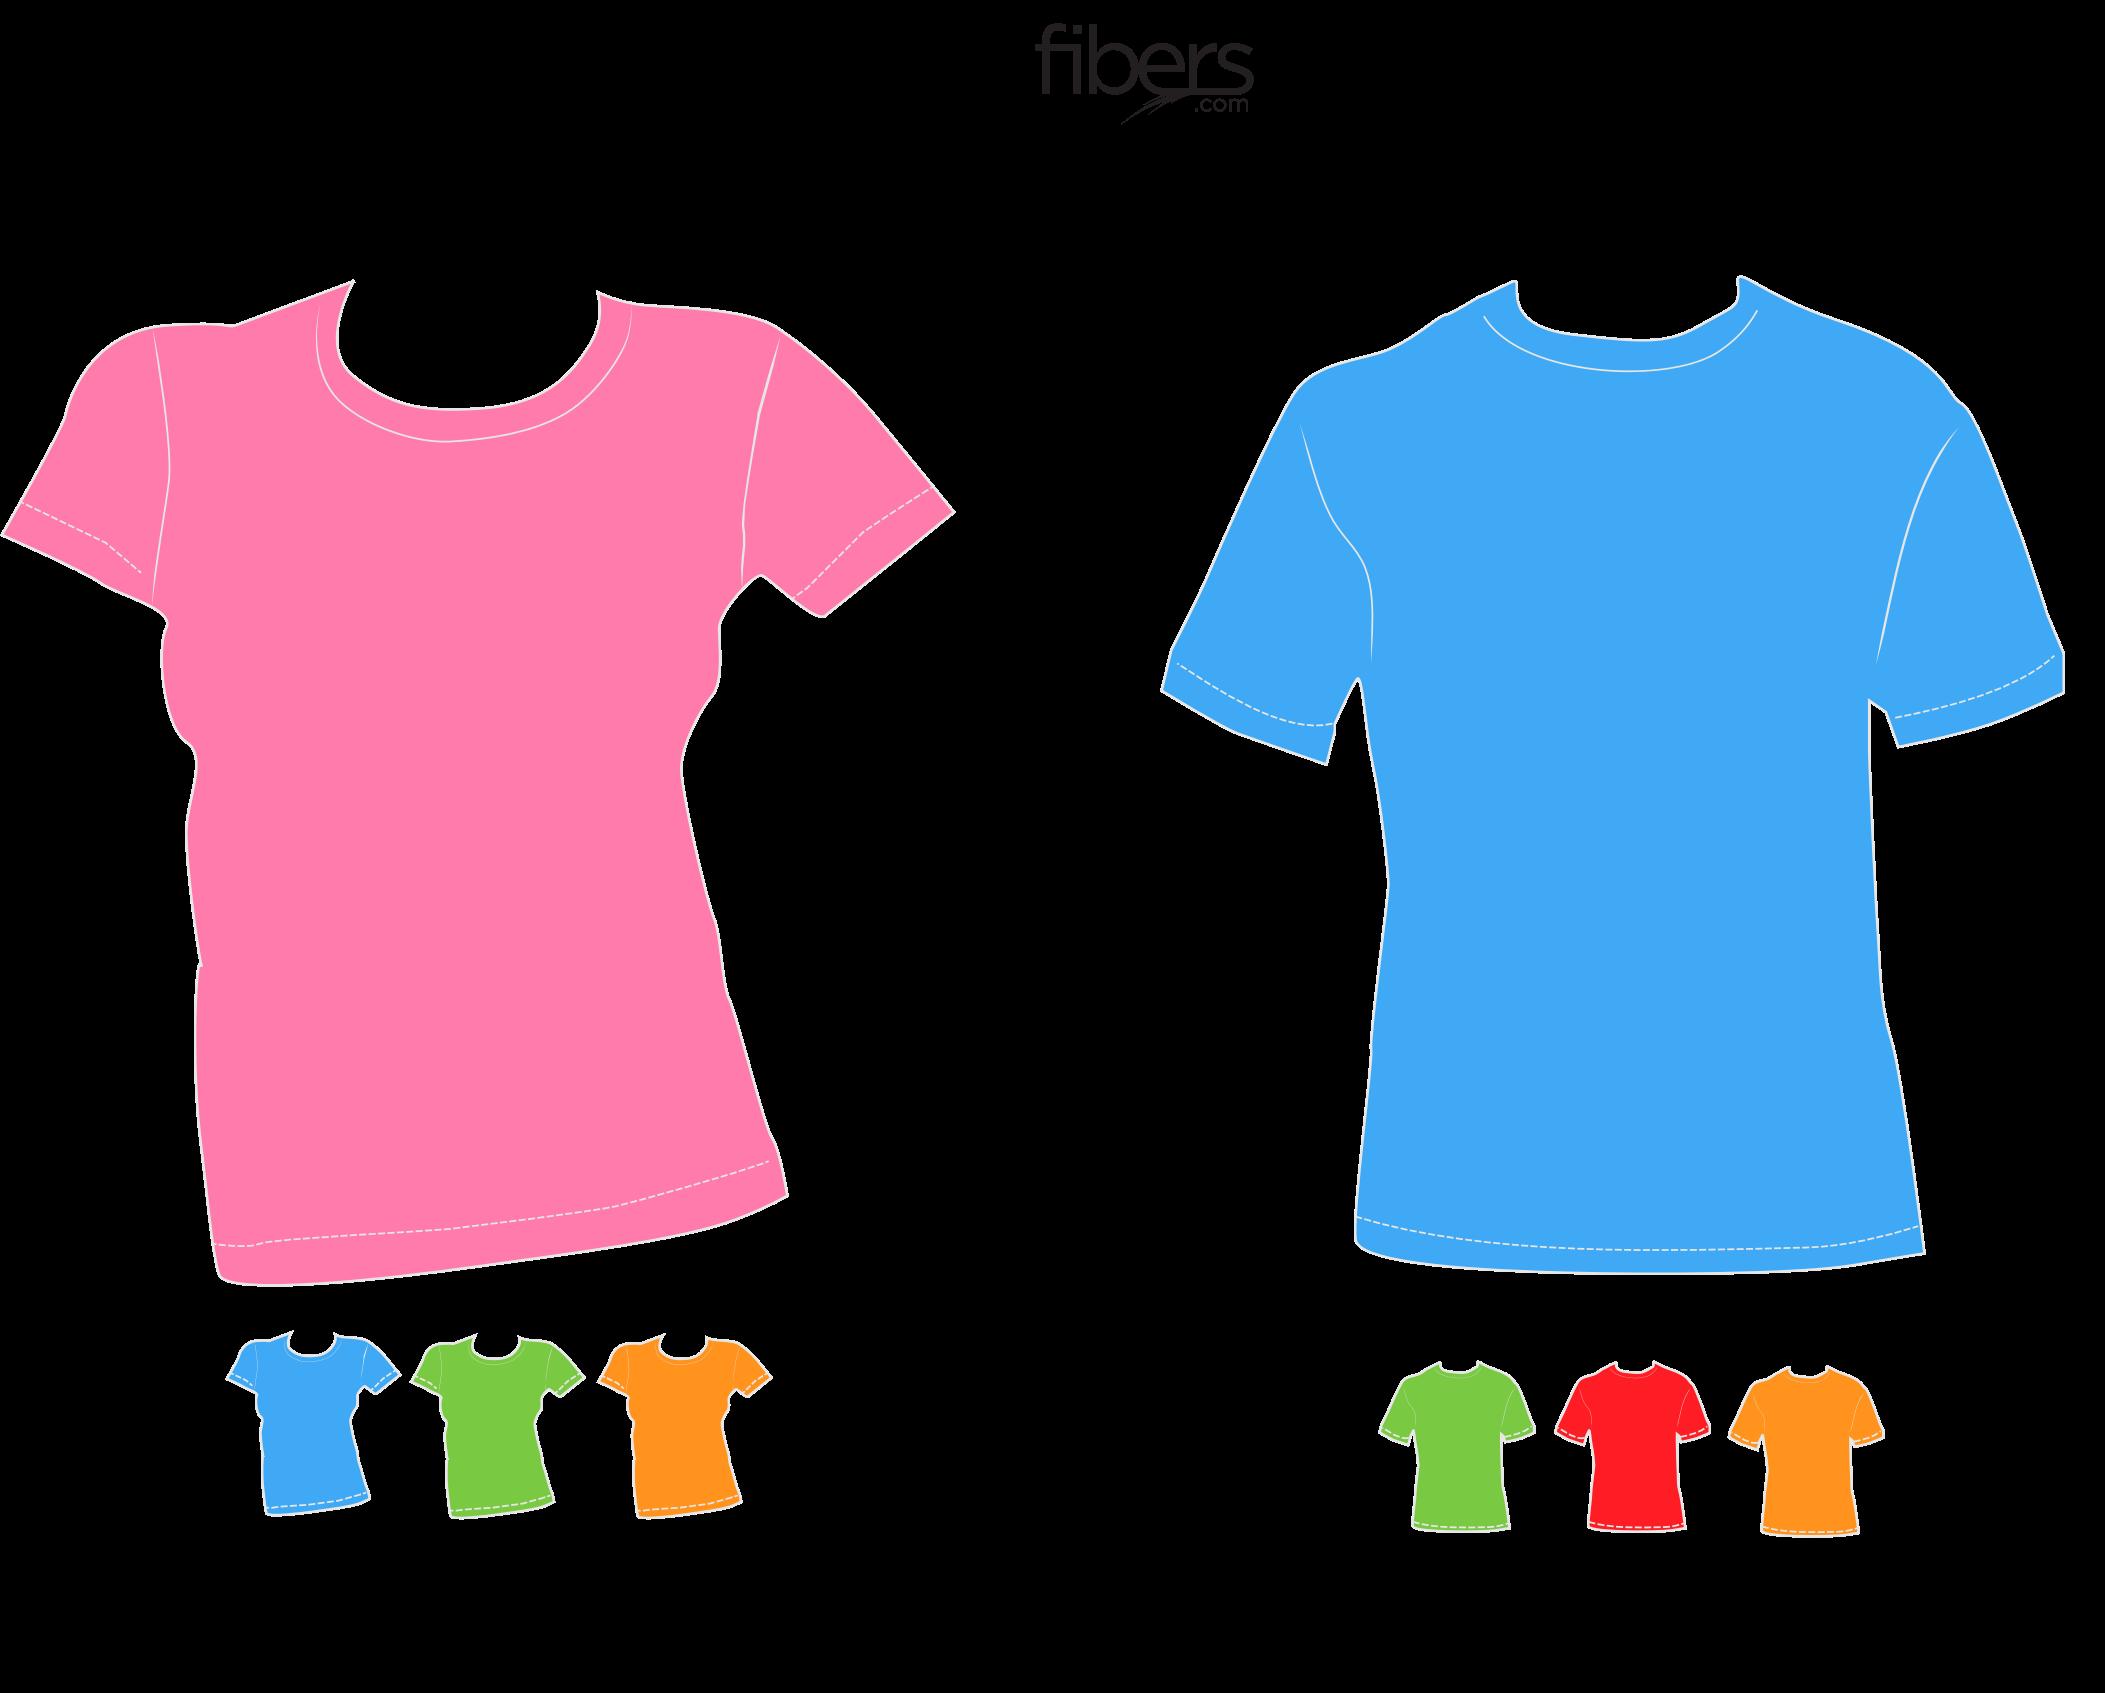 T Shirt Vector Png at GetDrawings | Free download